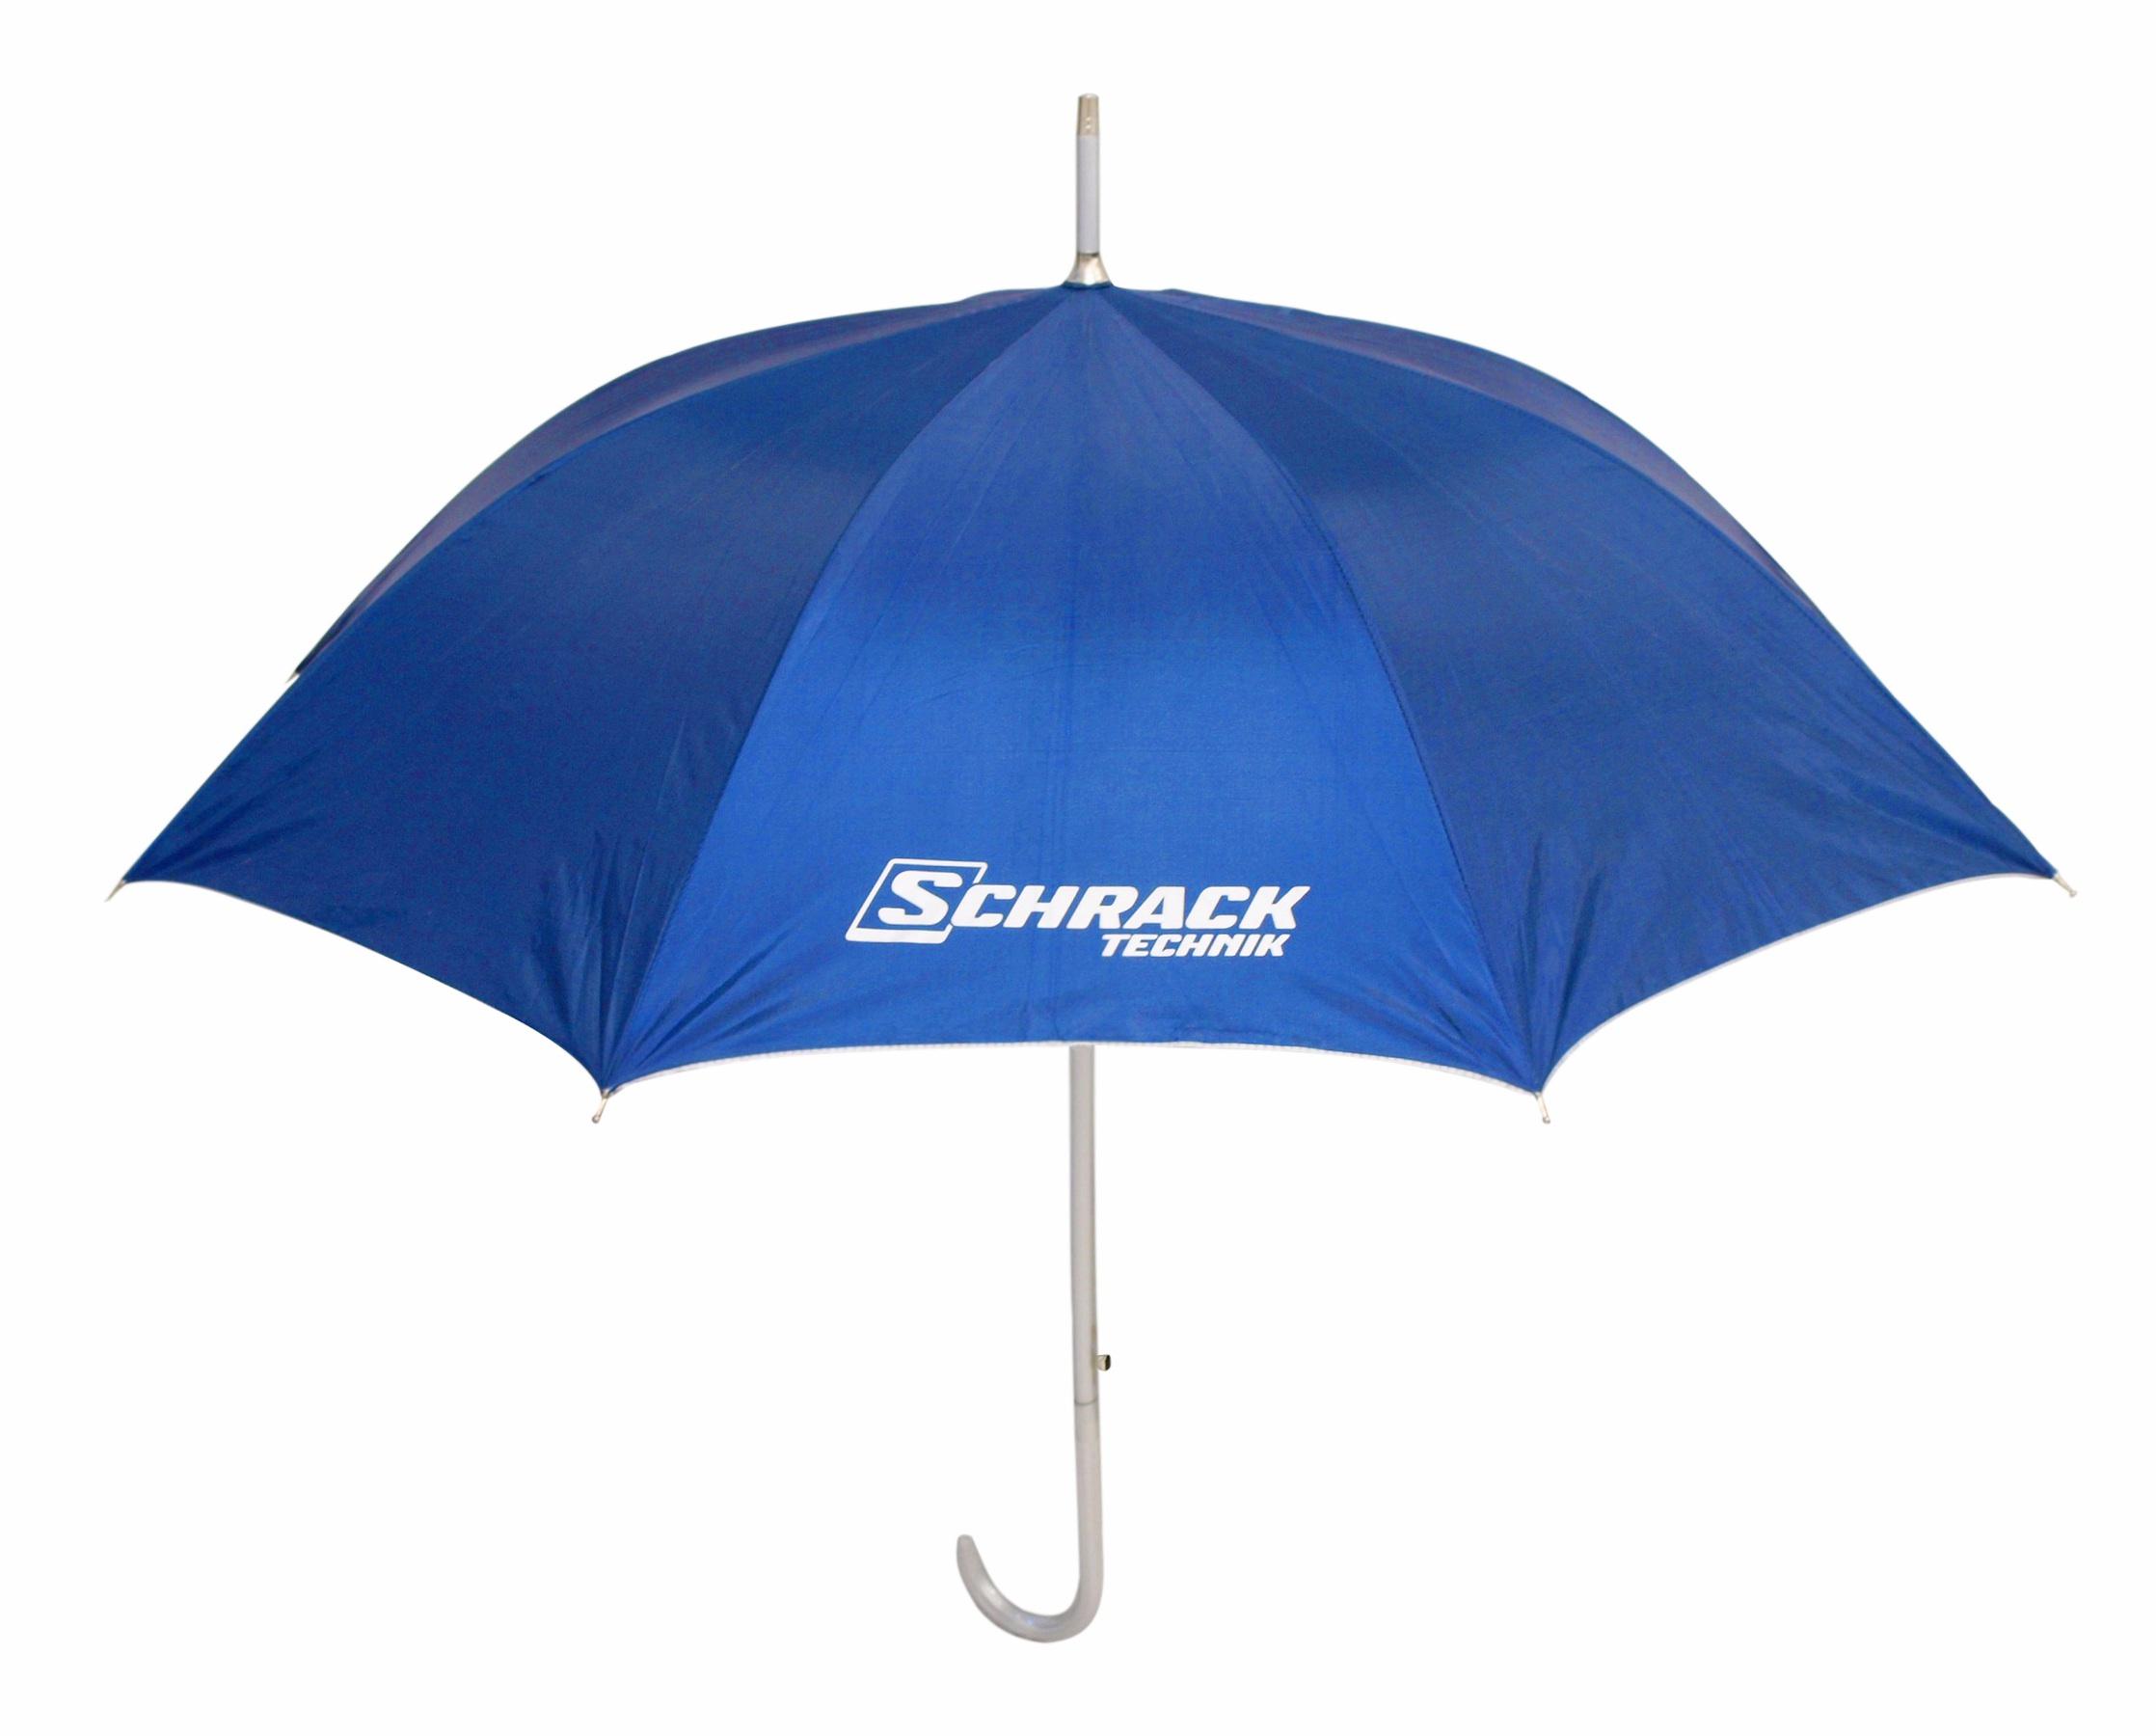 1 Stk Regenschirm blau/silber W-95000274